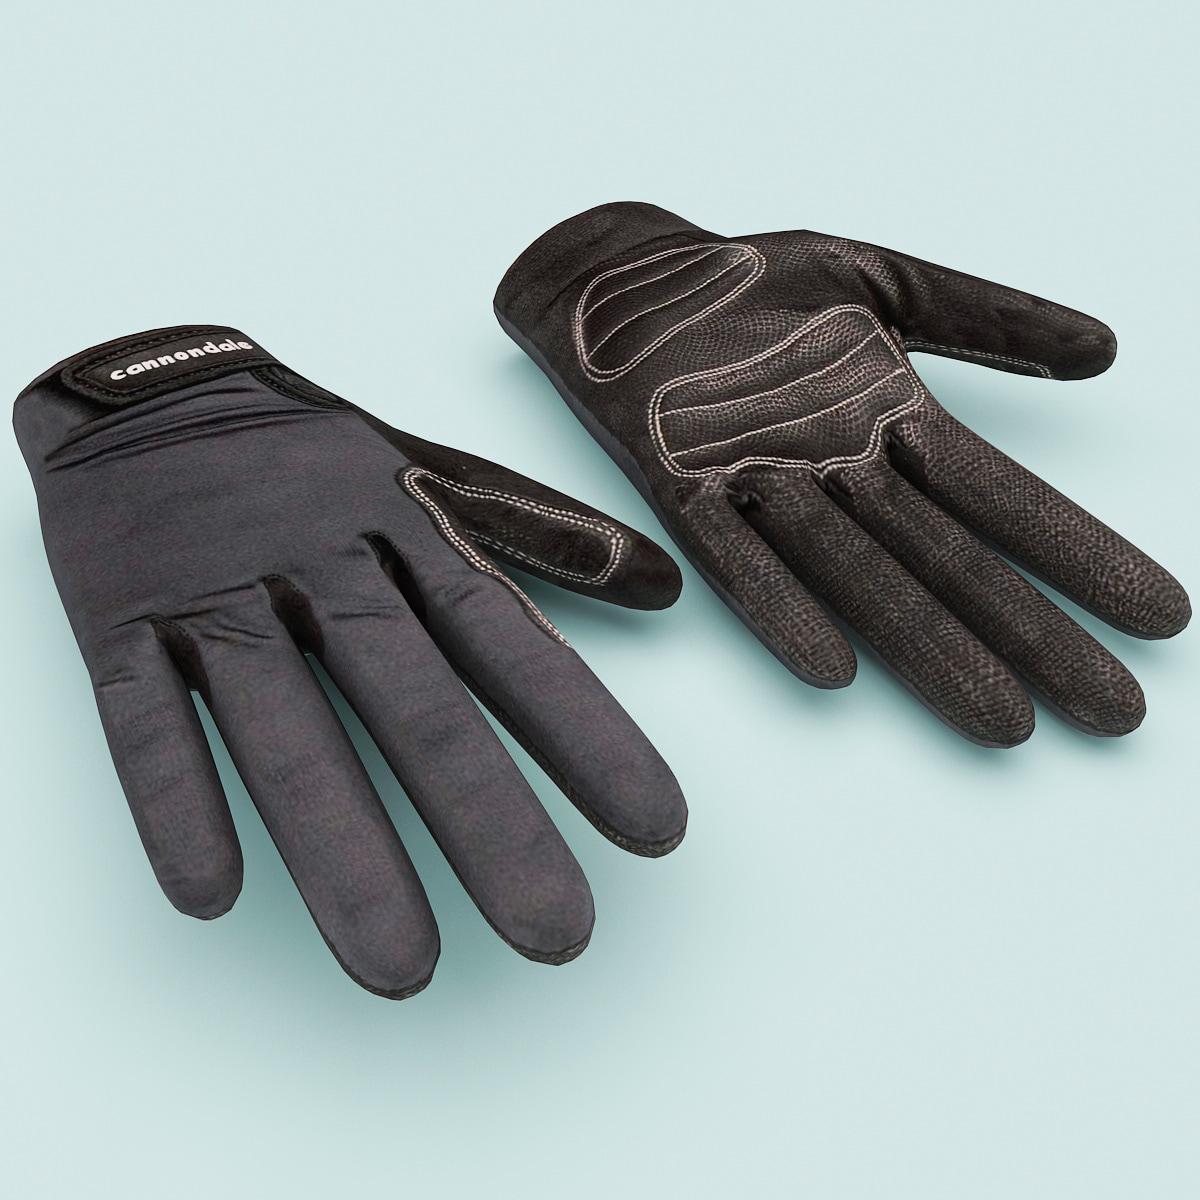 Cannondale_Gloves_001.jpg